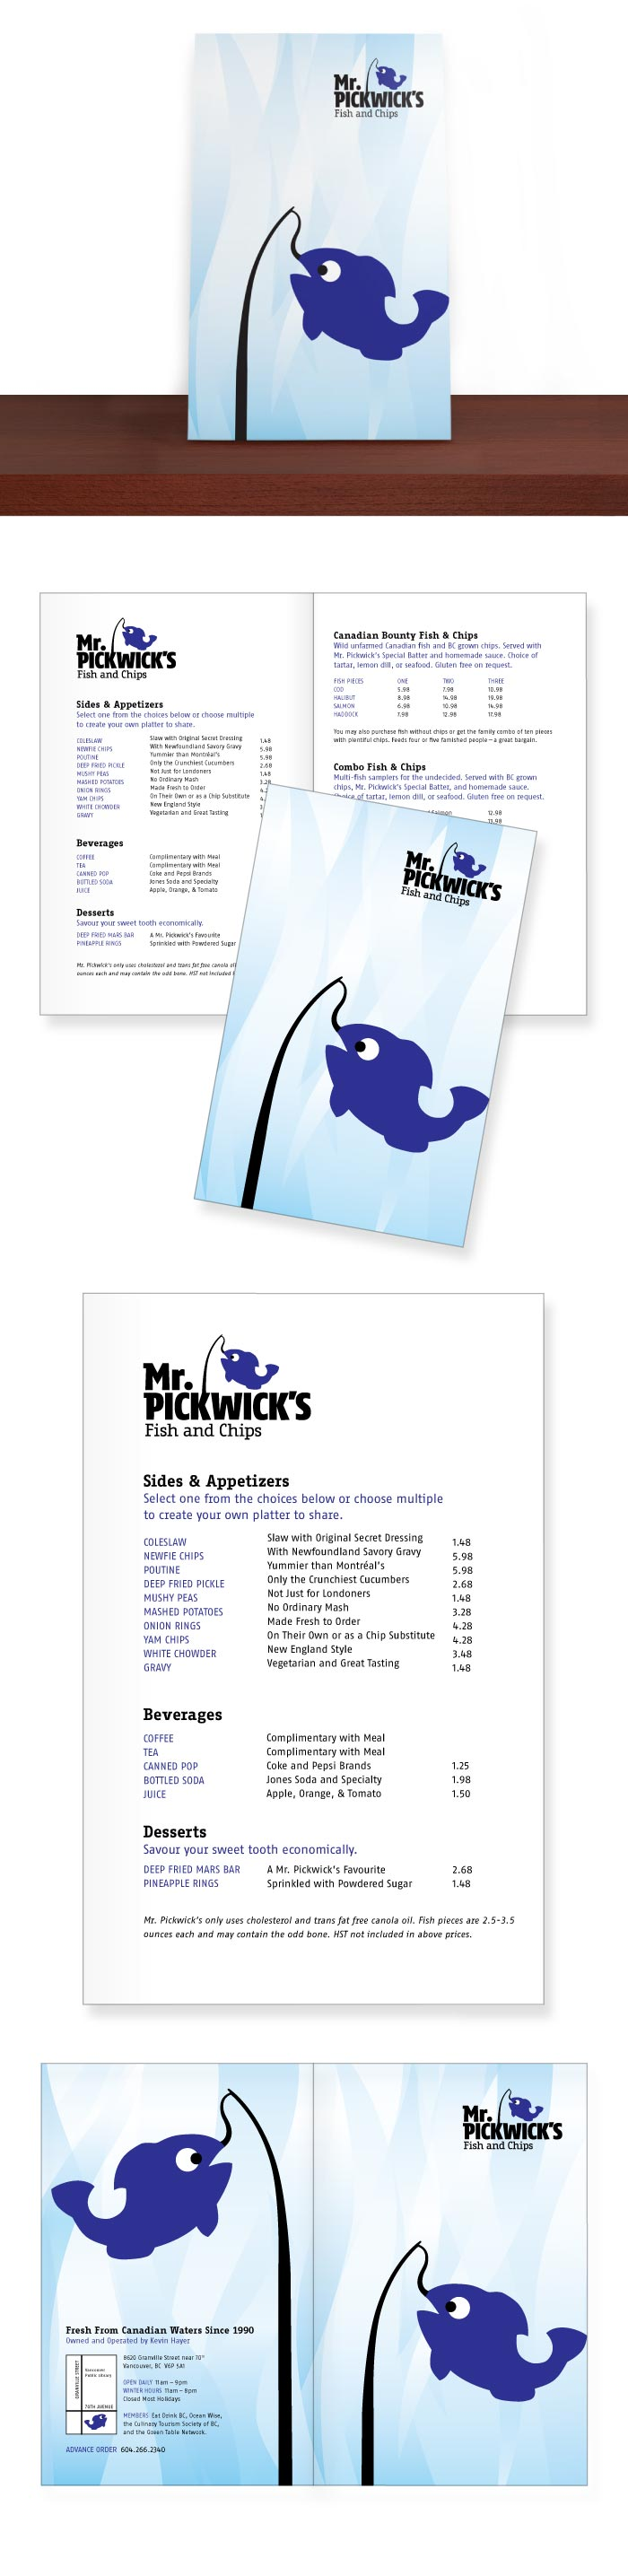 MrPickwicks-Timeline2